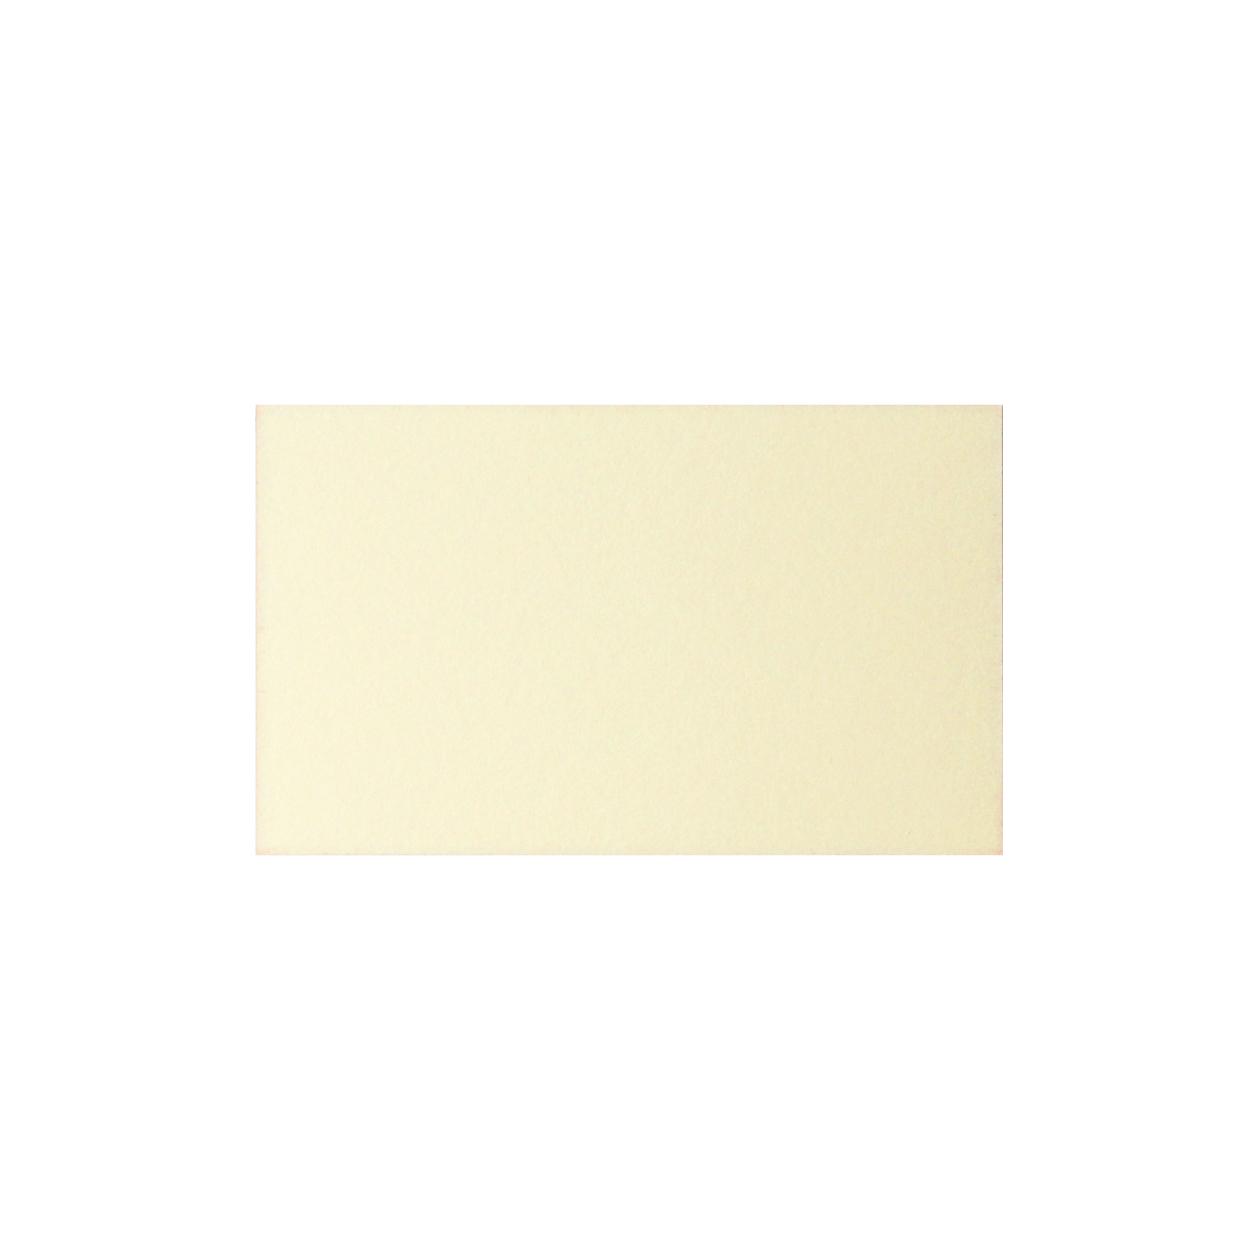 No.57ボーダード ネームカード ボルドー 232.8g